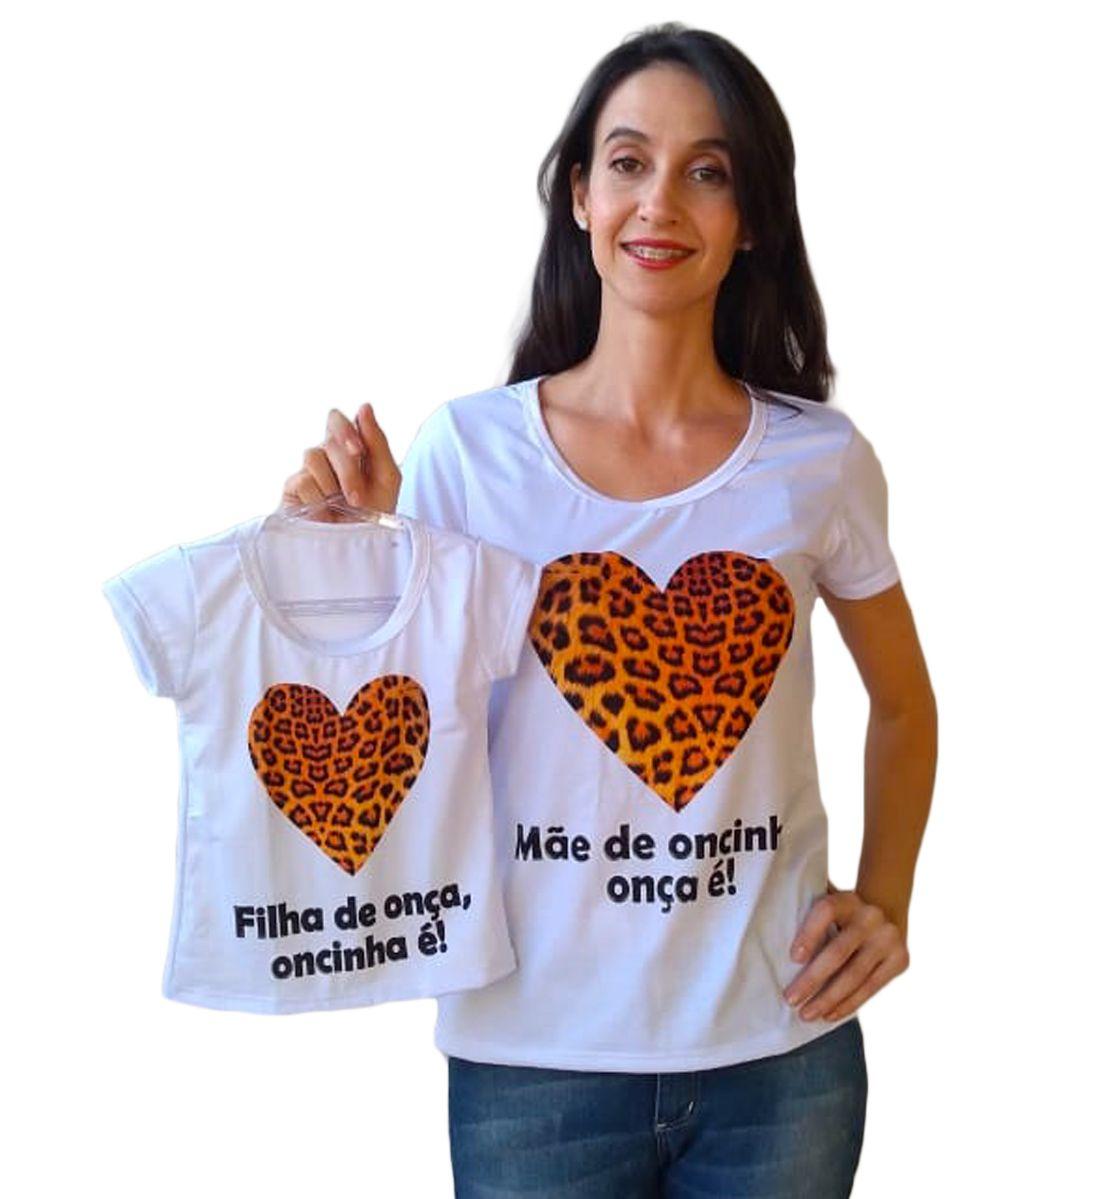 Camiseta adulta mãe de oncinha e infantil filha de onça Tal mãe tal filha